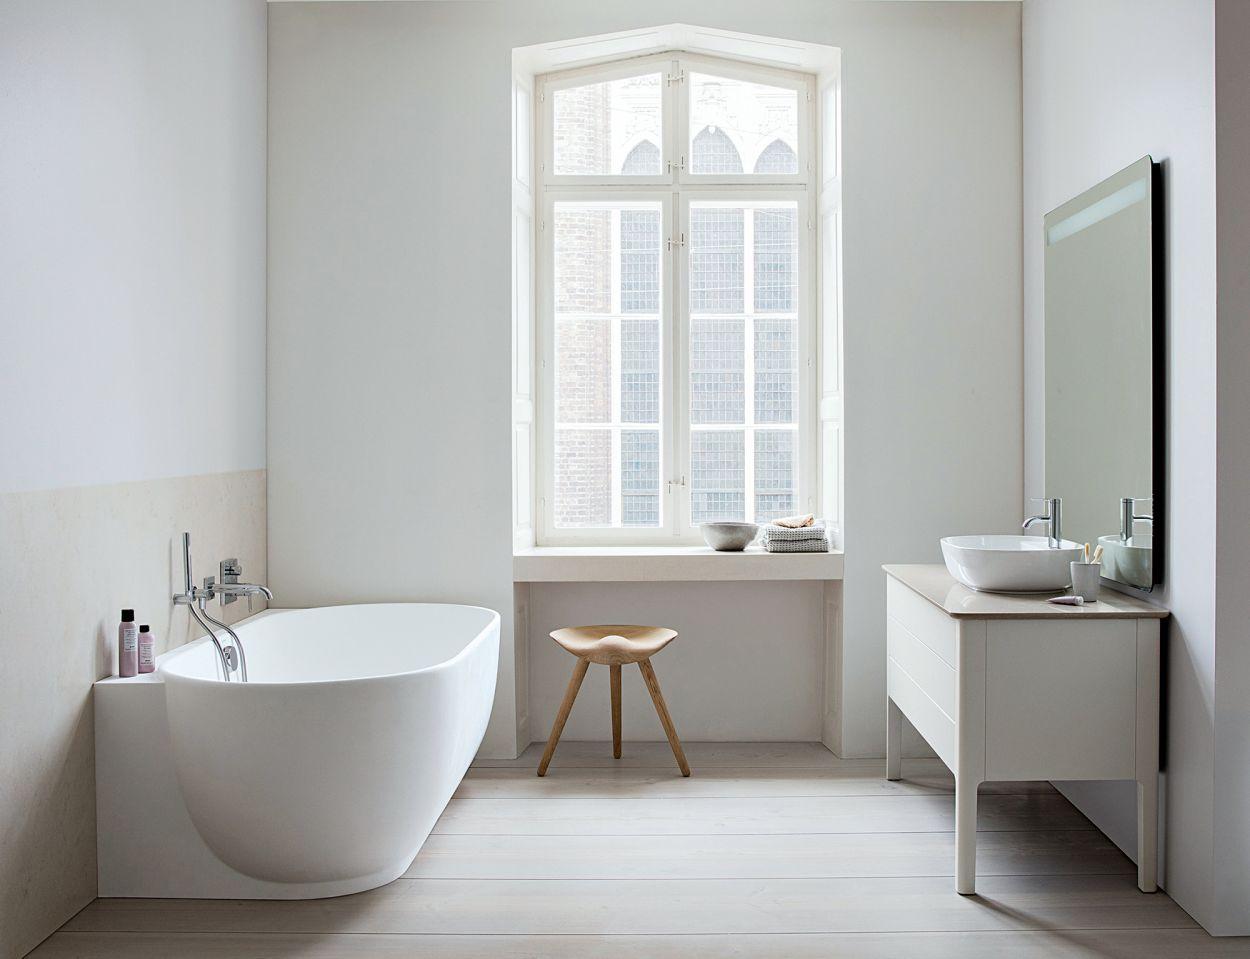 badezimmer-kollektionen - ad, Badezimmer ideen